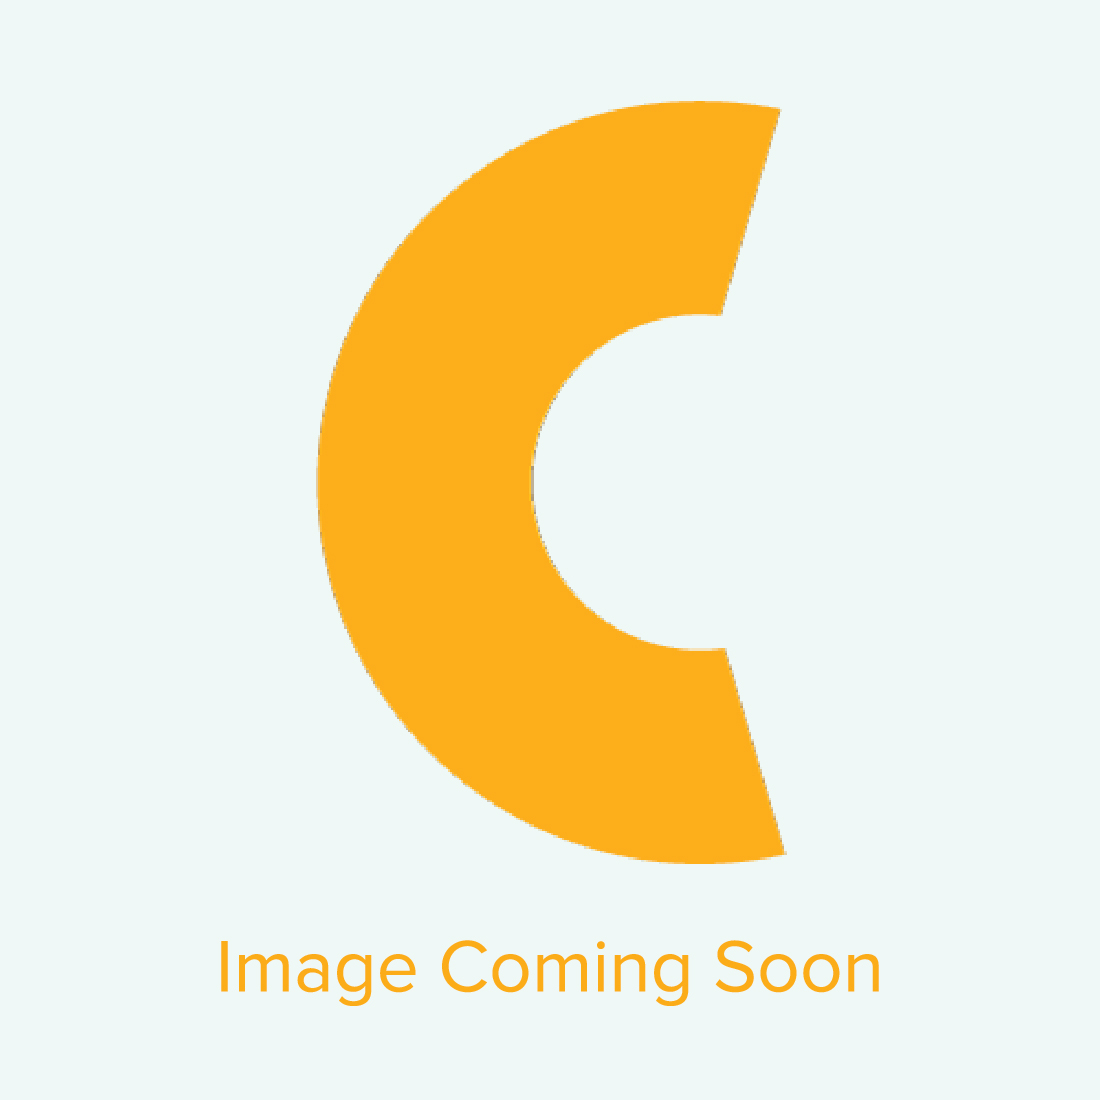 Epson F2100 Grip Pad Platen Cover - Medium